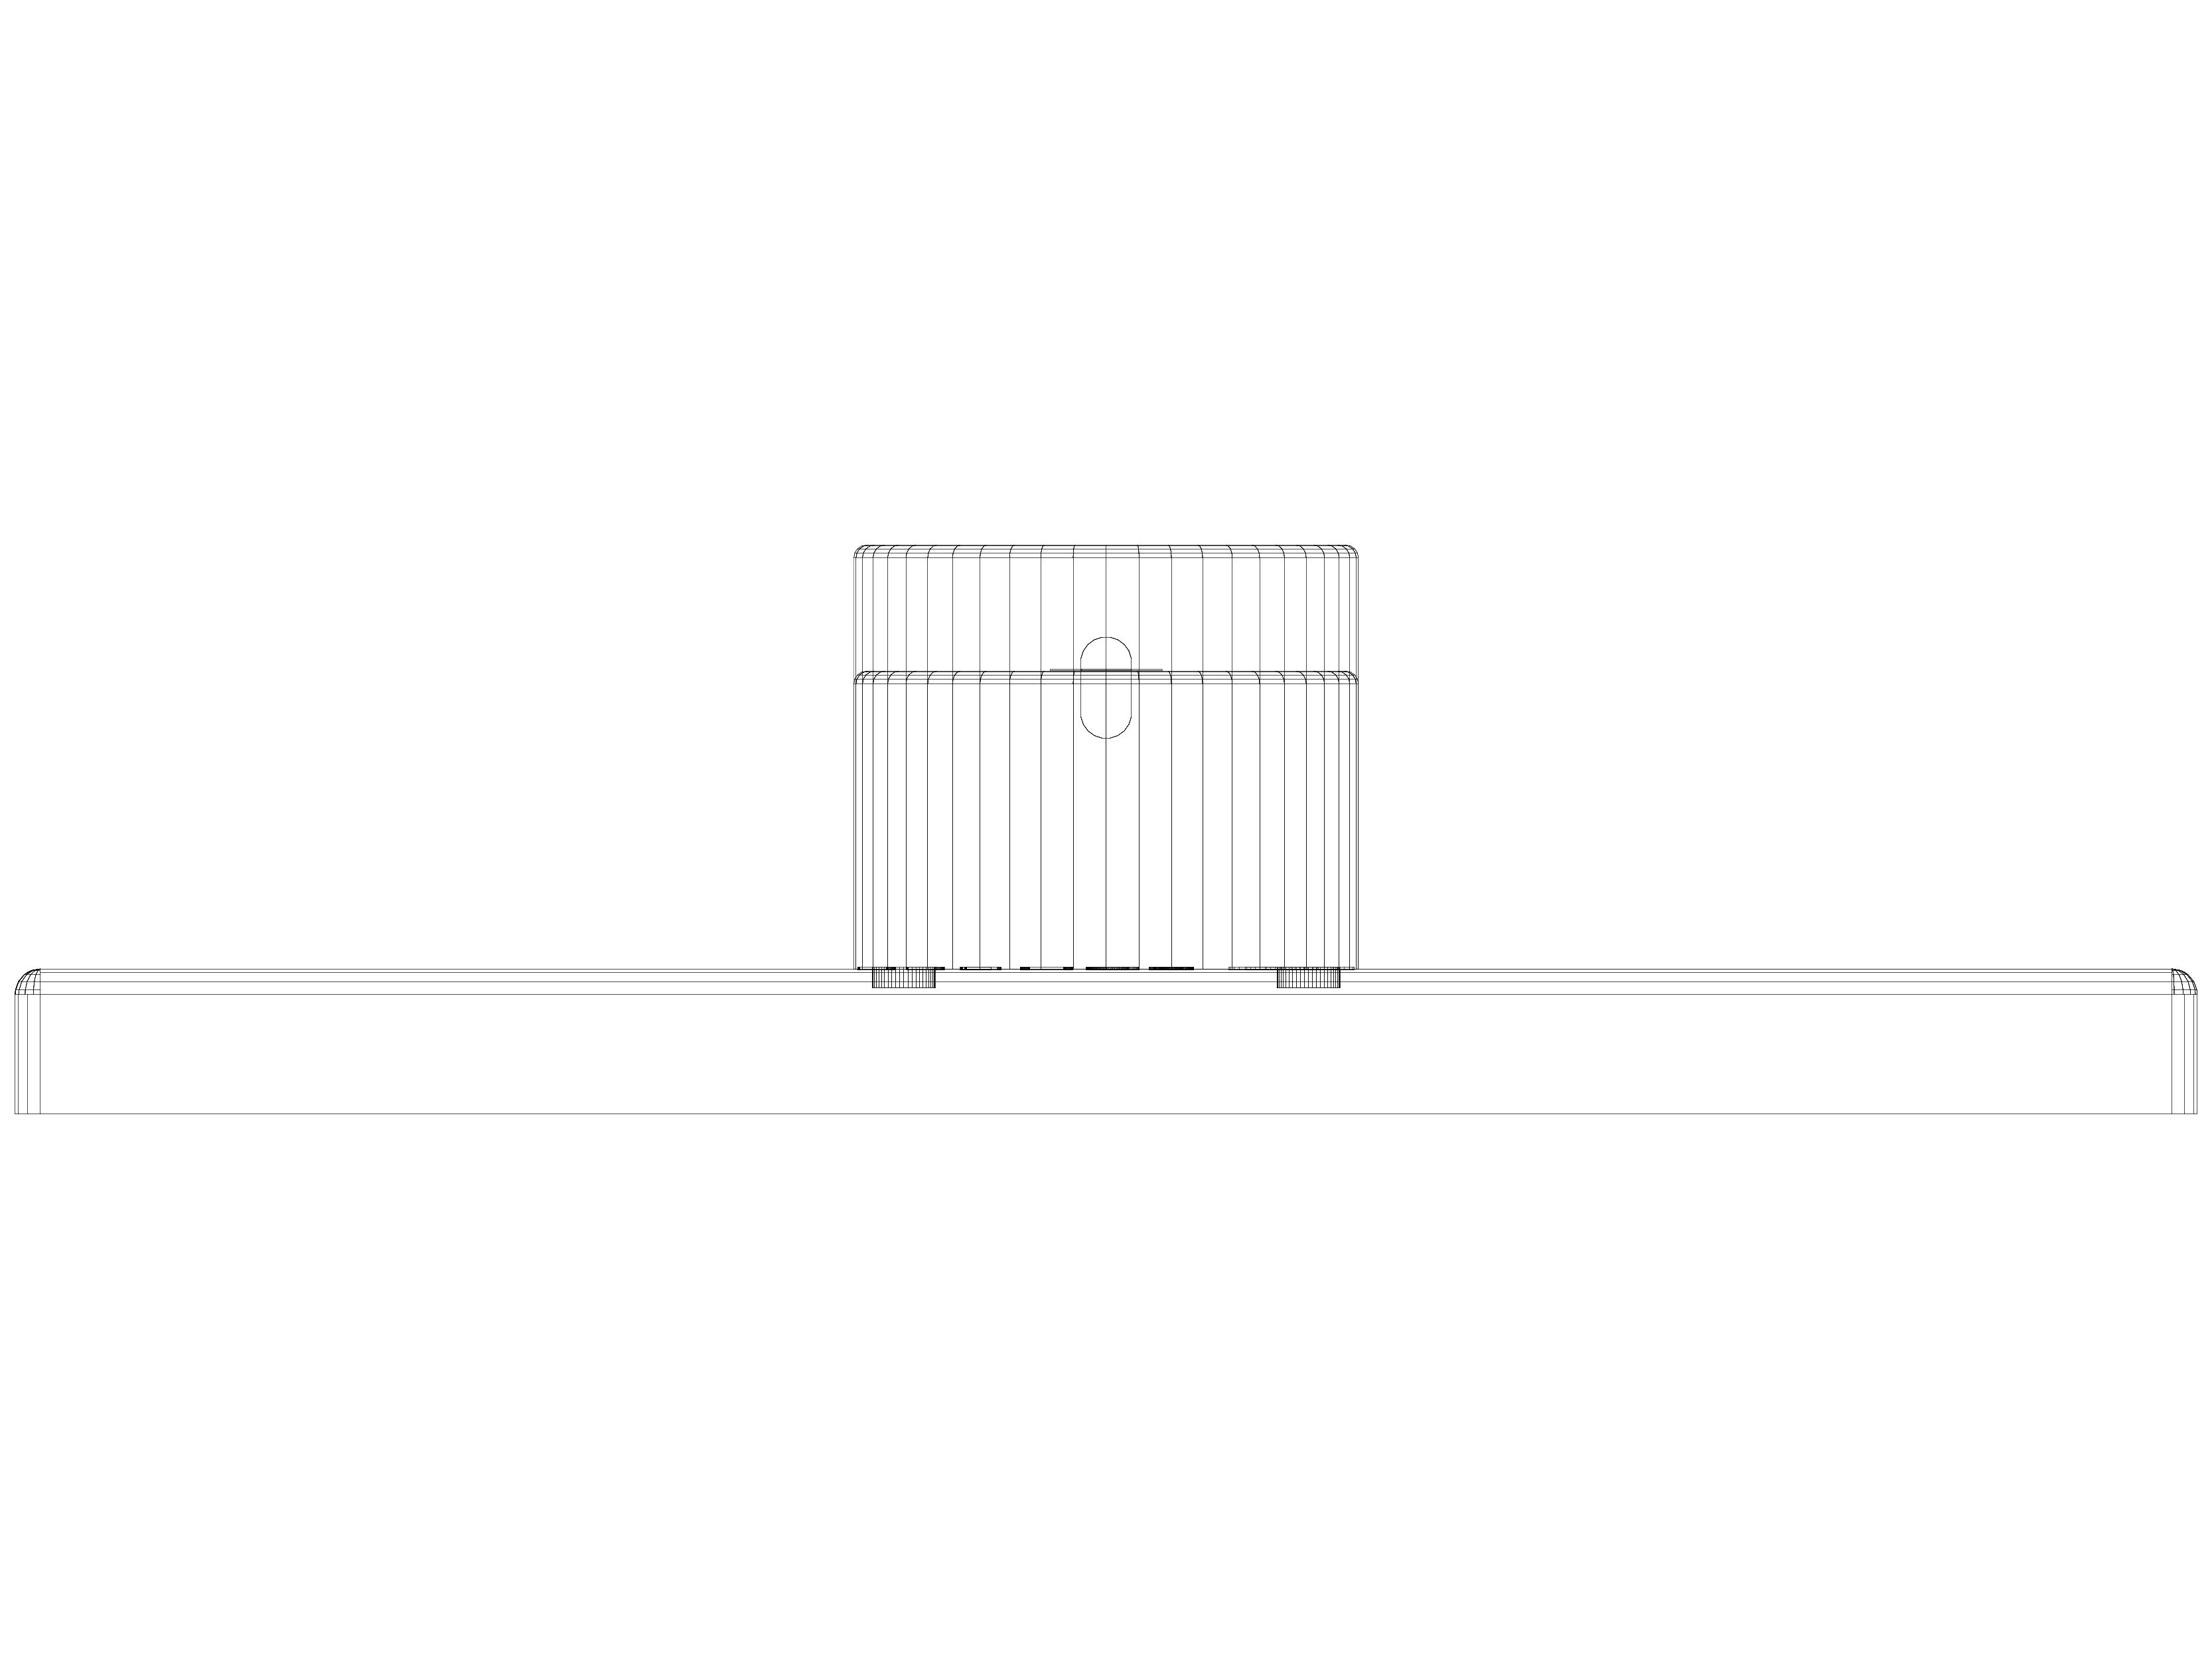 Pagina 1 - CAD-DWG Baterie cu montare in perete pentru dus SCHELL LINUS D-SC-T 01 809 06 99 SCHELL...